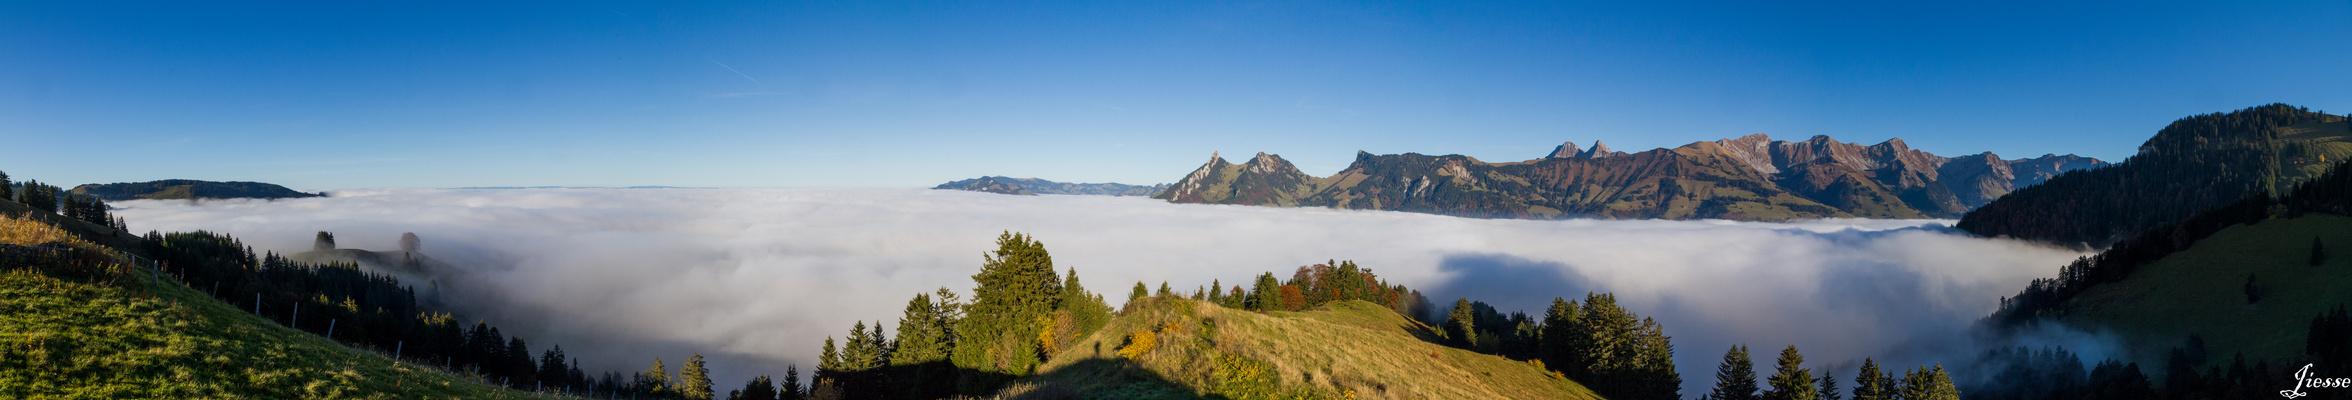 Alpes fribourgeoises